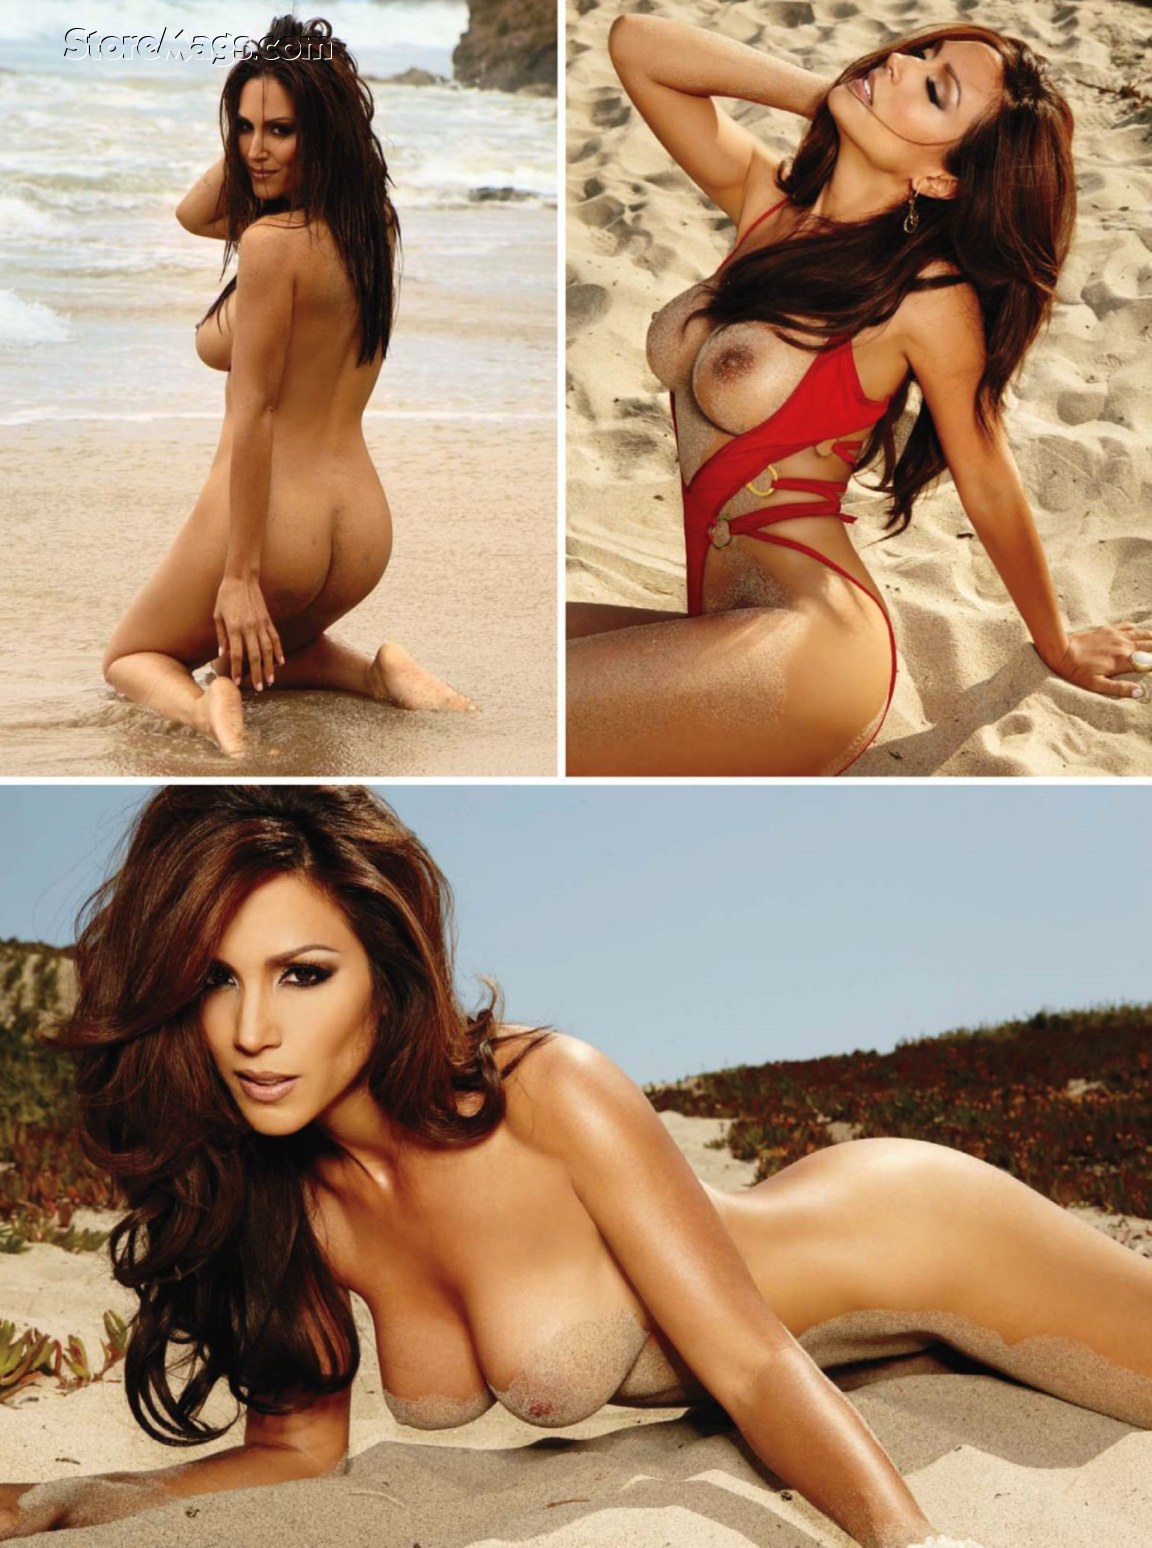 Leeann tweeden nude playboy pics, pornstar friday official site